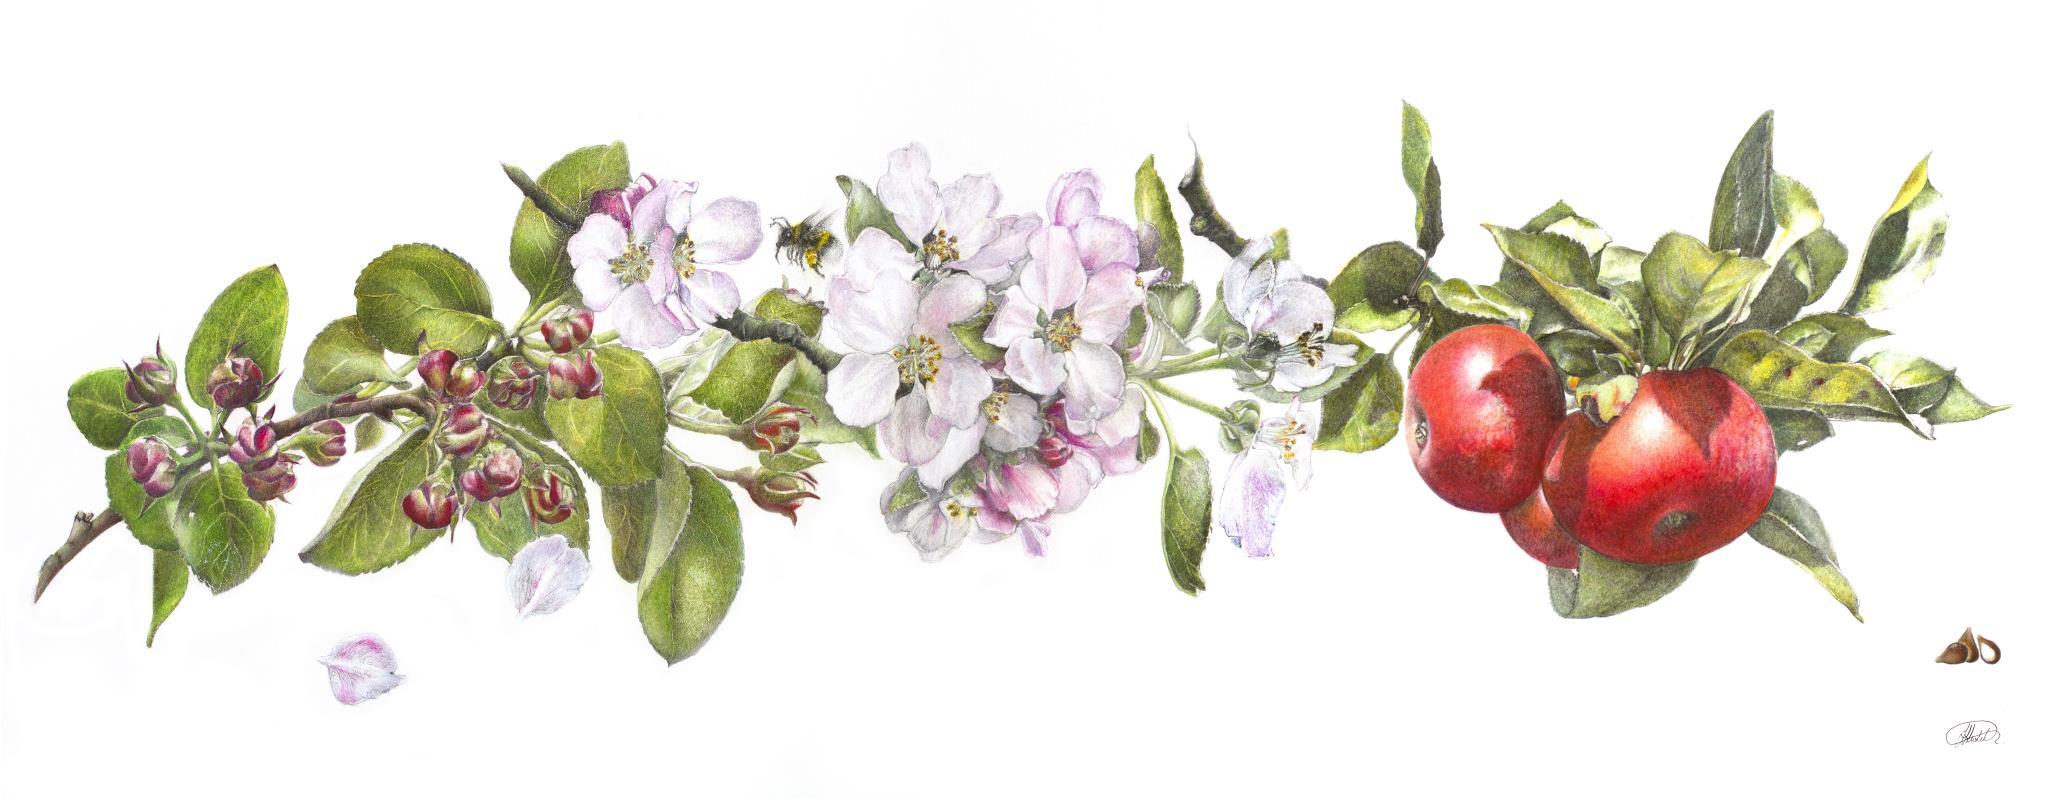 Malus domestica. Worcester Pearmain   AWARD: Certificate of Botanical Merit